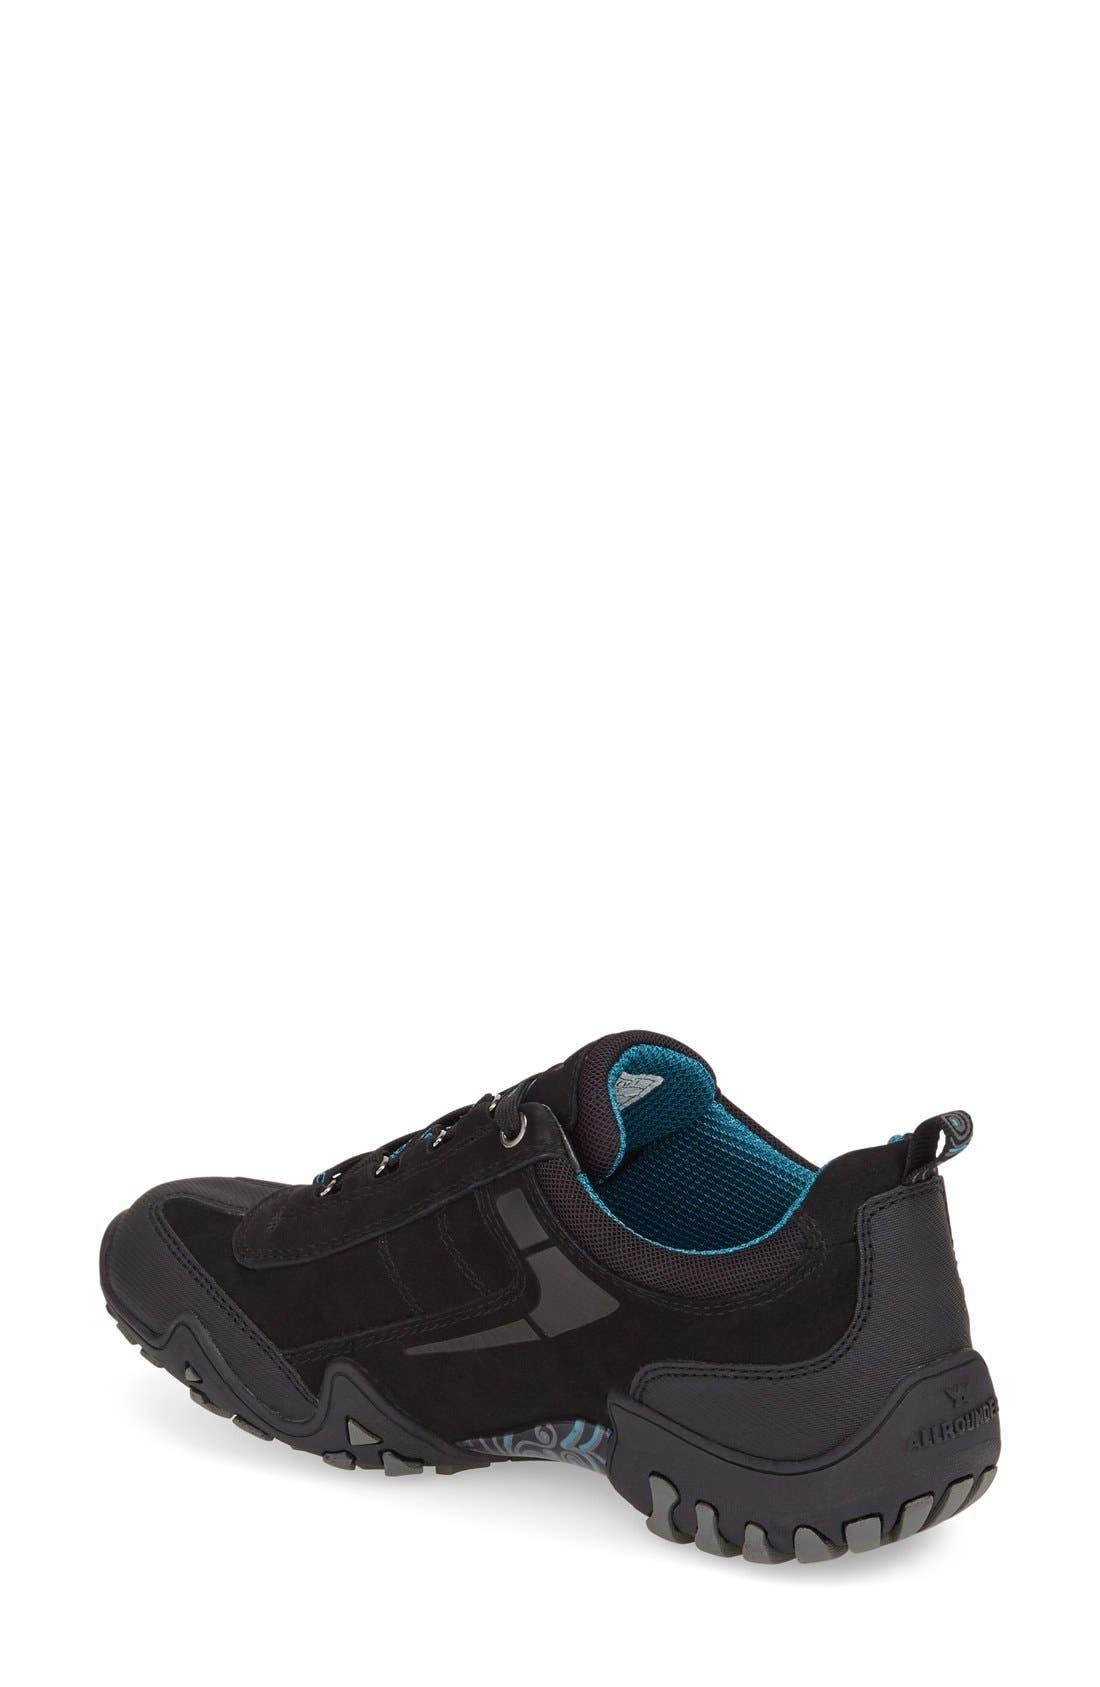 ALLROUNDER BY MEPHISTO, 'Fina-Tex' Sneaker, Alternate thumbnail 2, color, 013